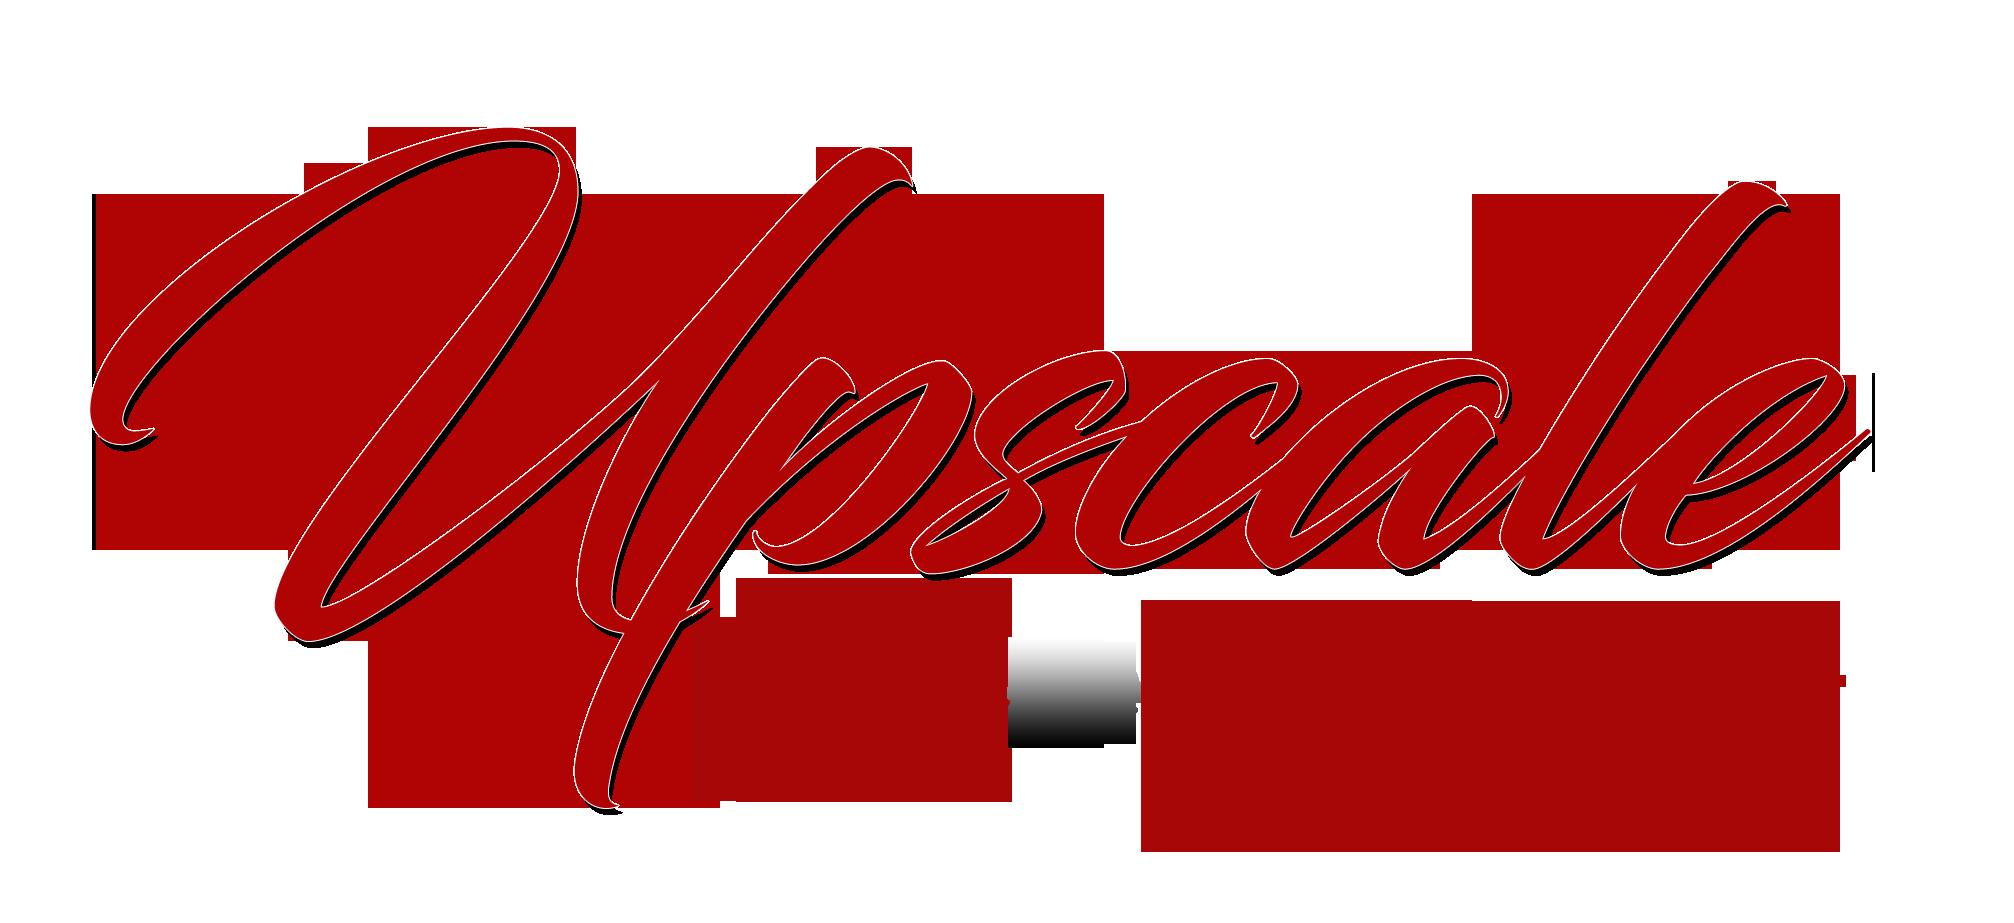 Upscale Photography